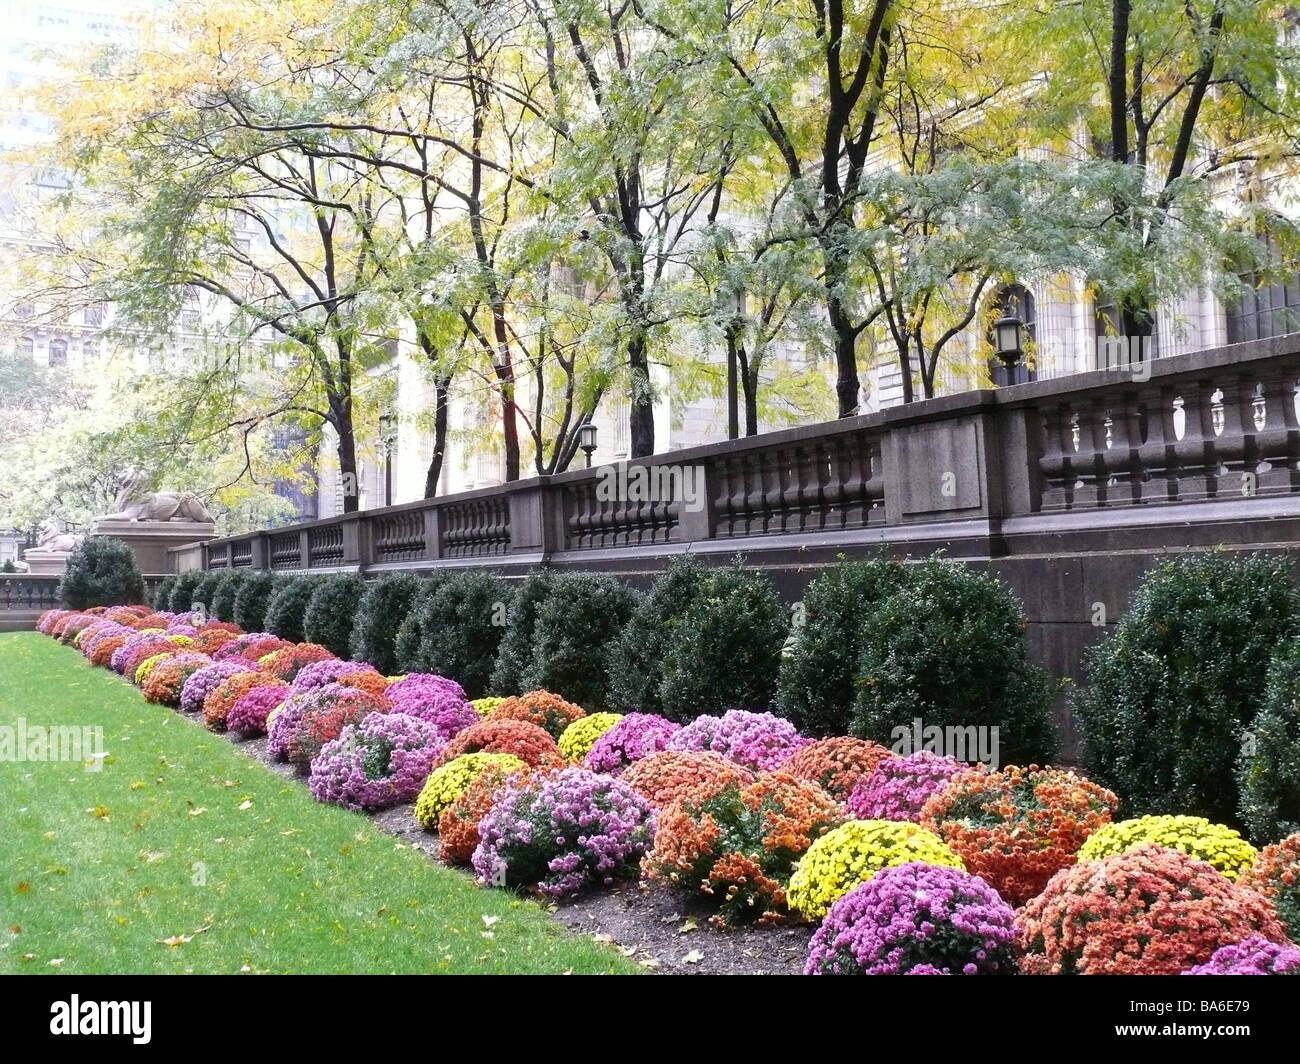 Exceptional USA New York City New York Public Library Outside Garden Flower Beds  America City Manhattan Buildings Facade Detail Wall Garden